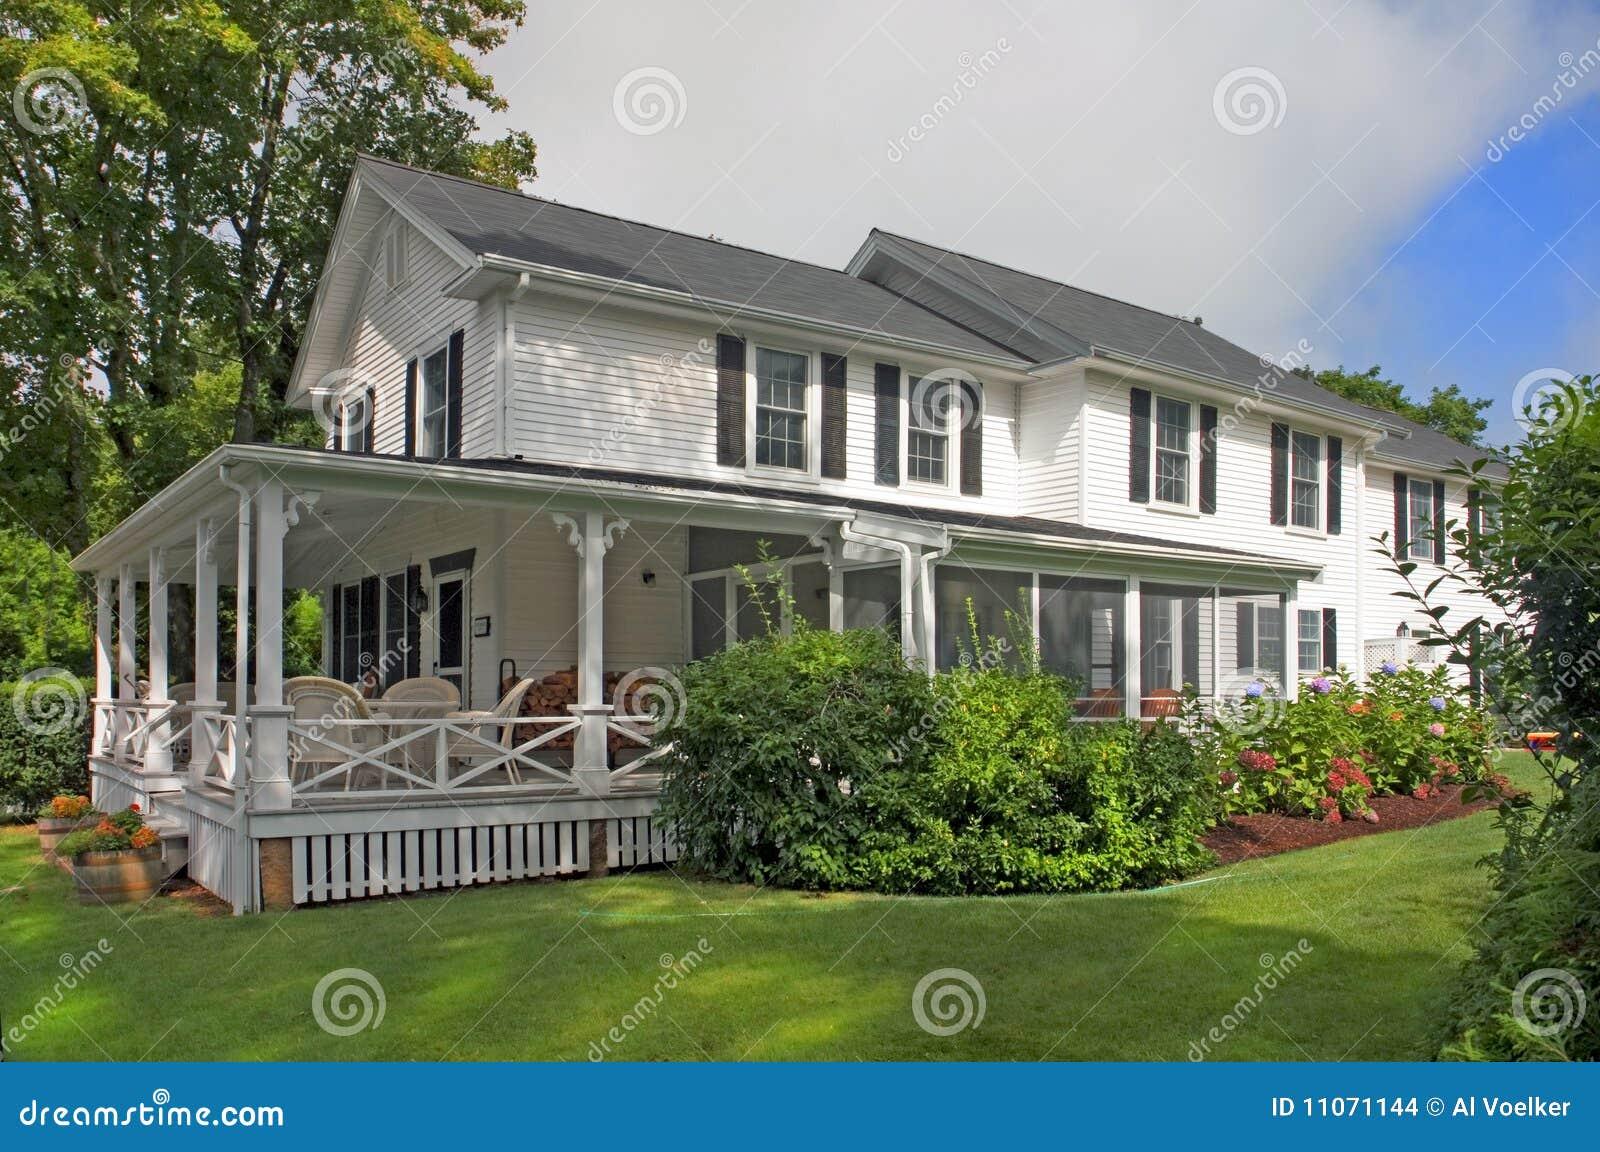 Case americane classiche fotografia stock immagine di for Foto di case arredate classiche